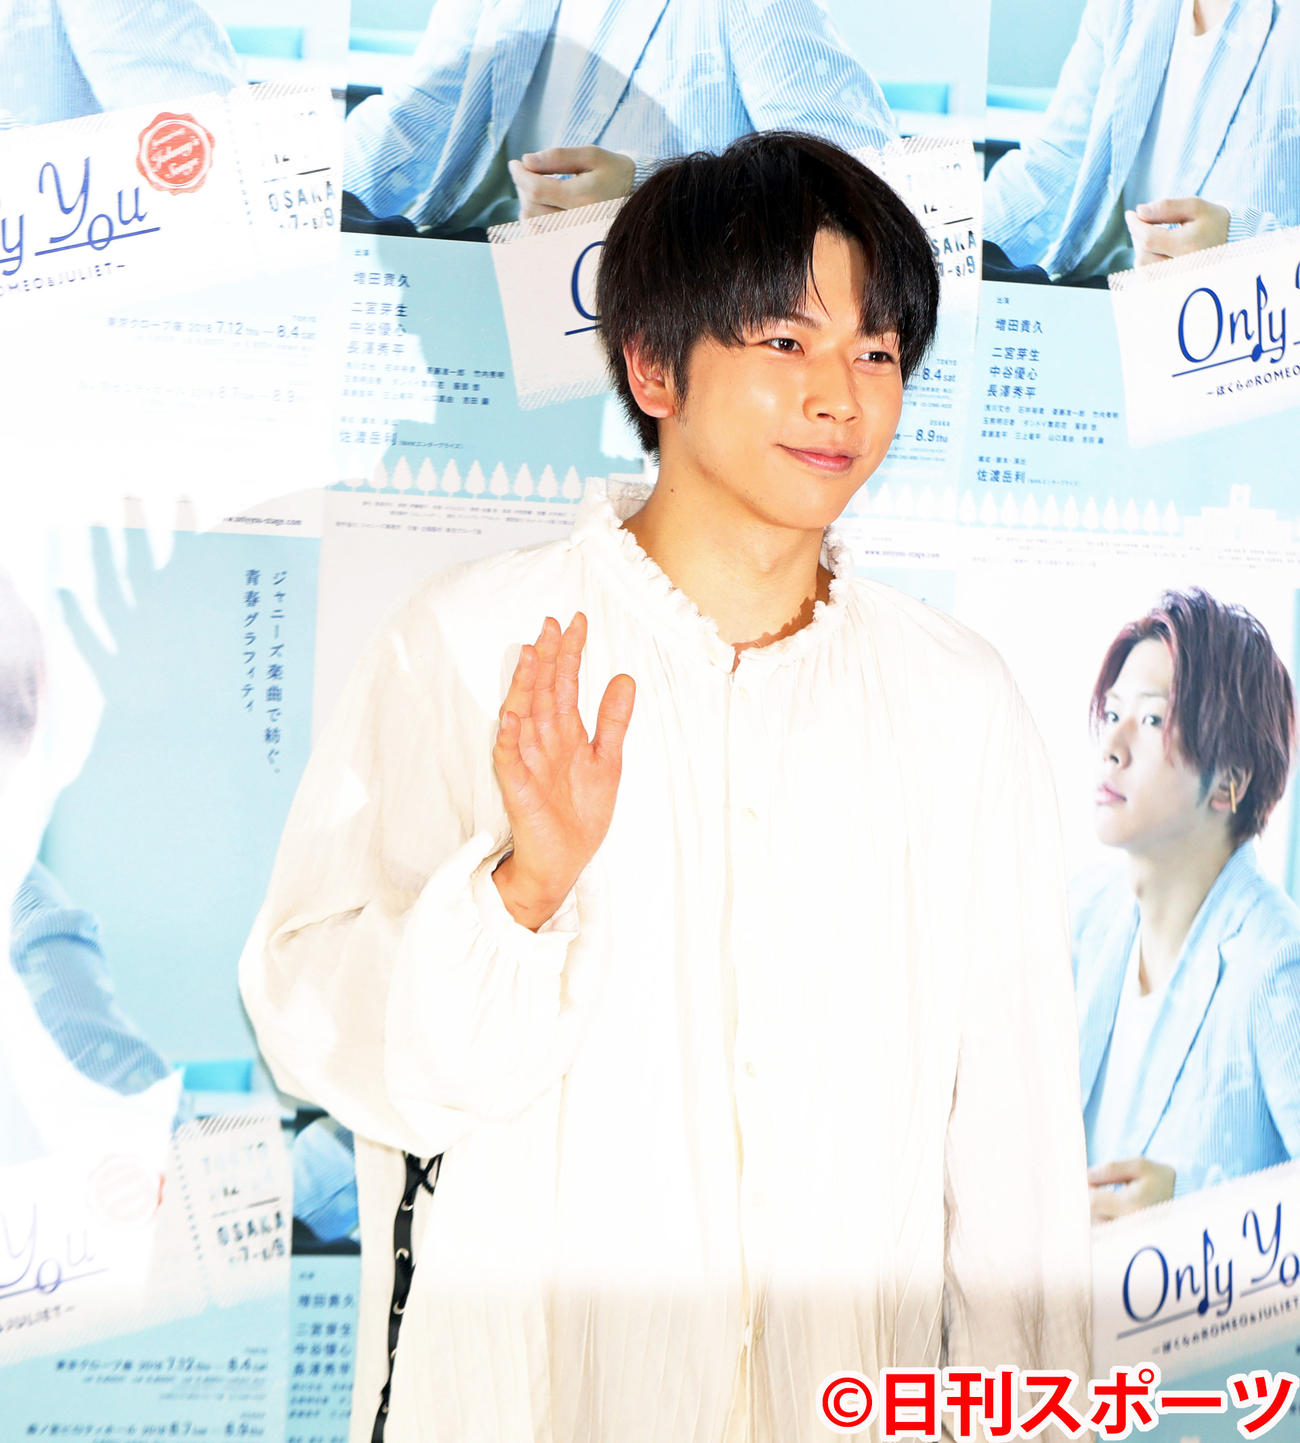 https://www.nikkansports.com/entertainment/news/img/201807120000925-w1300_1.jpg